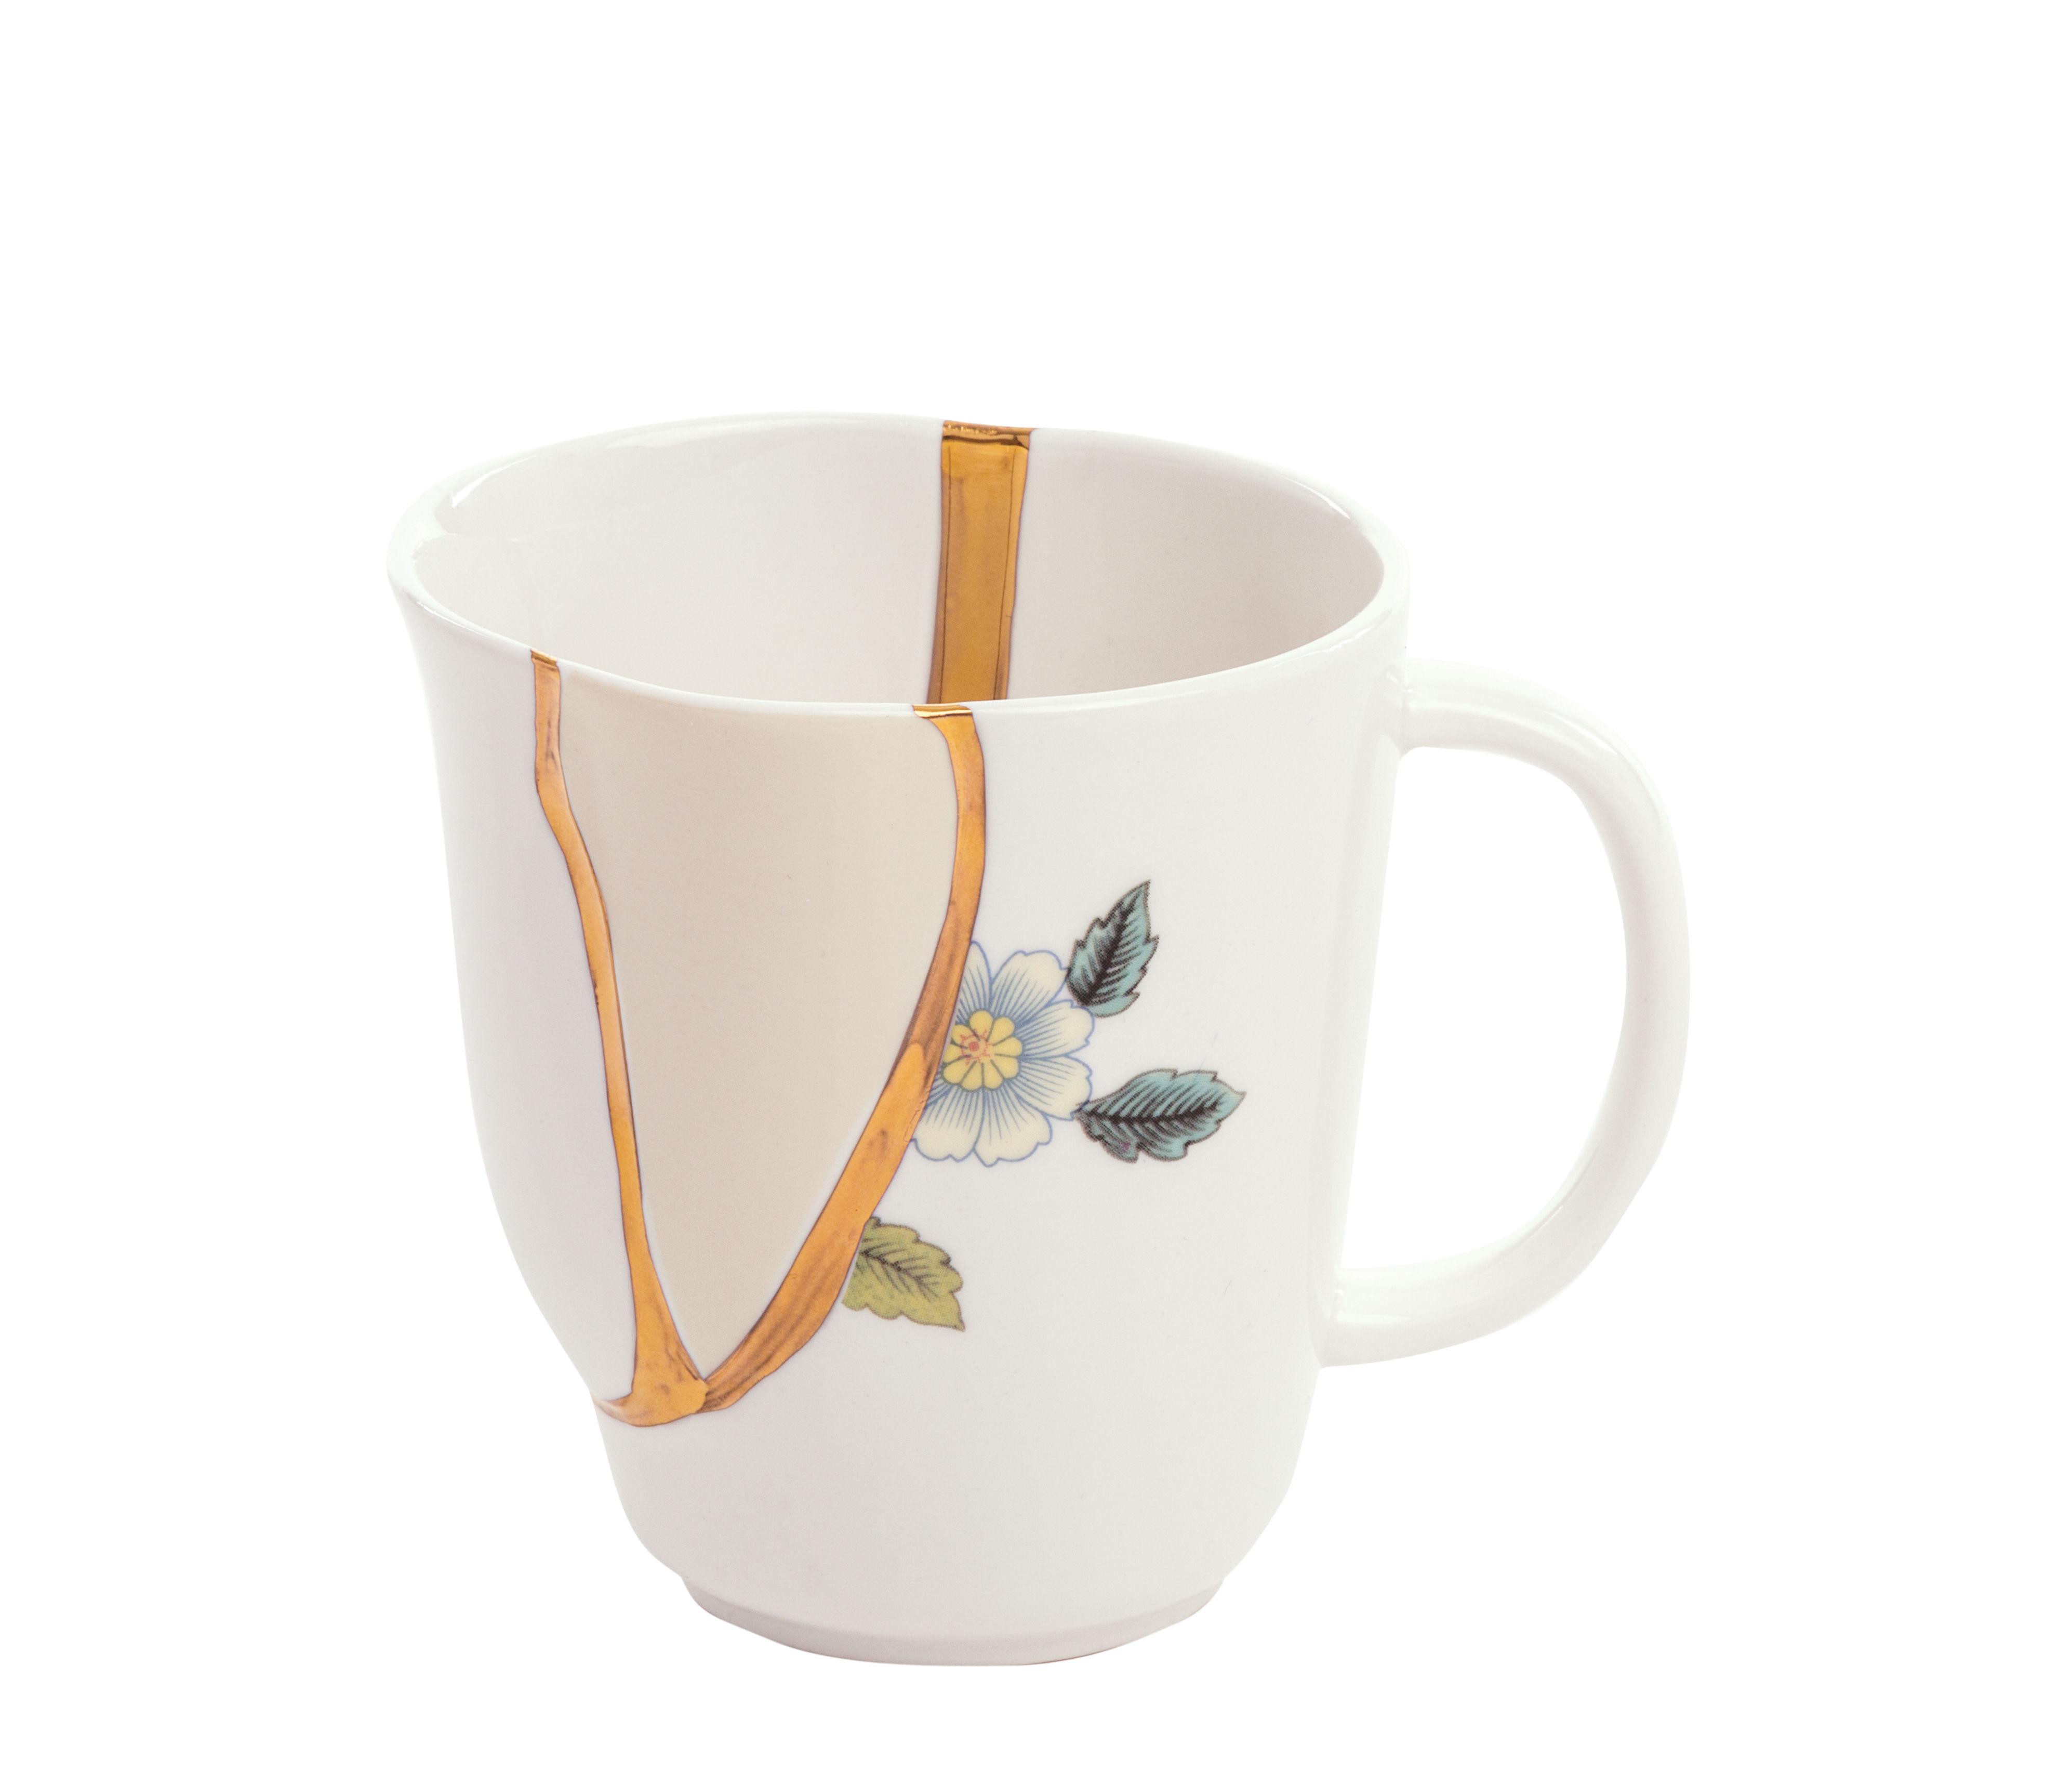 Tableware - Coffee Mugs & Tea Cups - Kintsugi Mug - / Porcelain & gold finish by Seletti - White & gold / Blue patterns - China, Gold